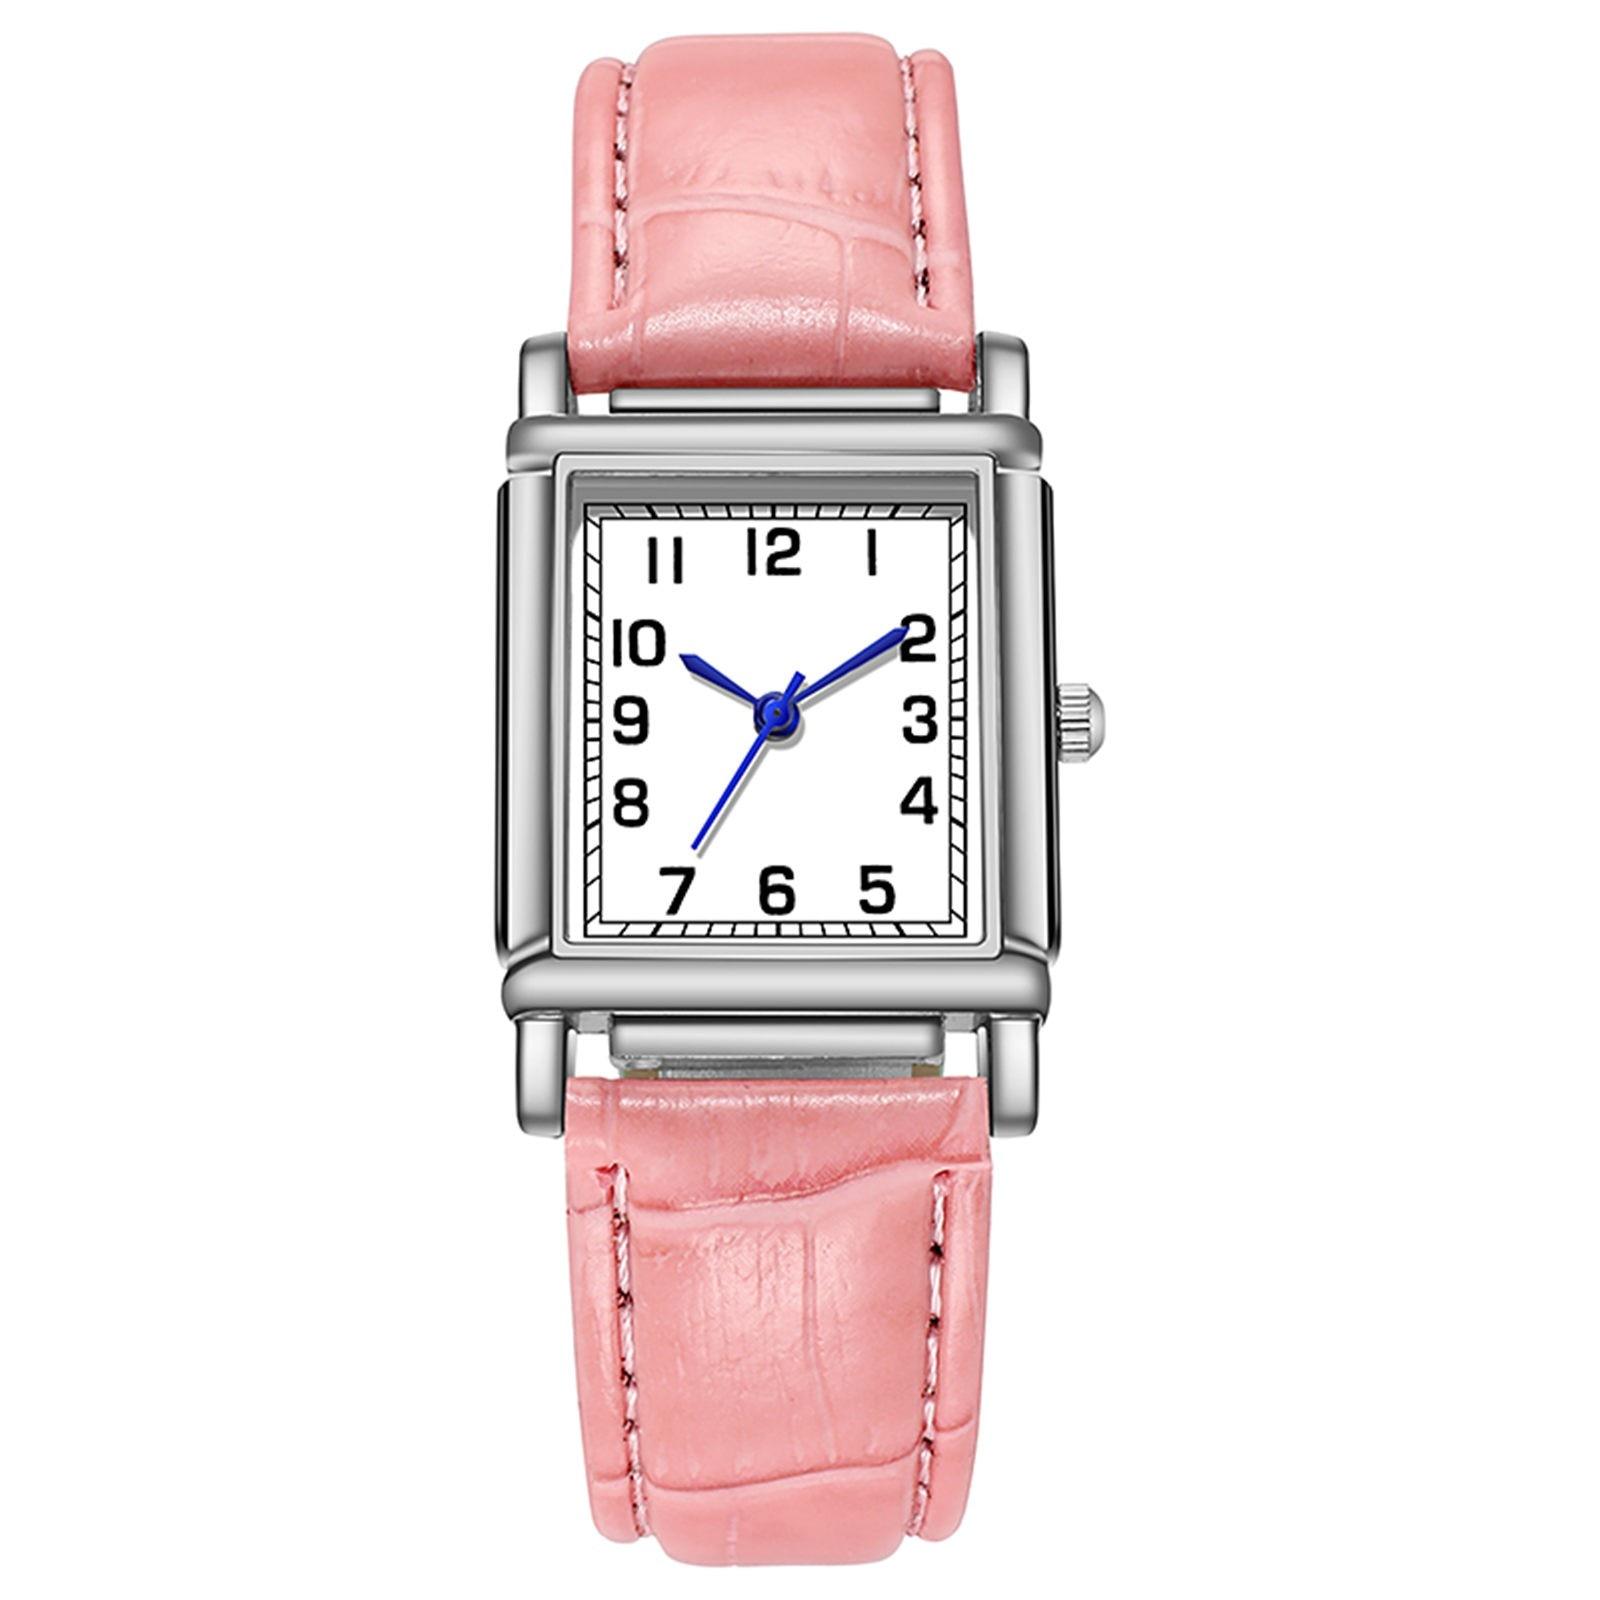 Silvery Luxury Woman Mechanical Wristwatch Stainless Steel Gmt Watch Top Brand Sapphire Glass Female